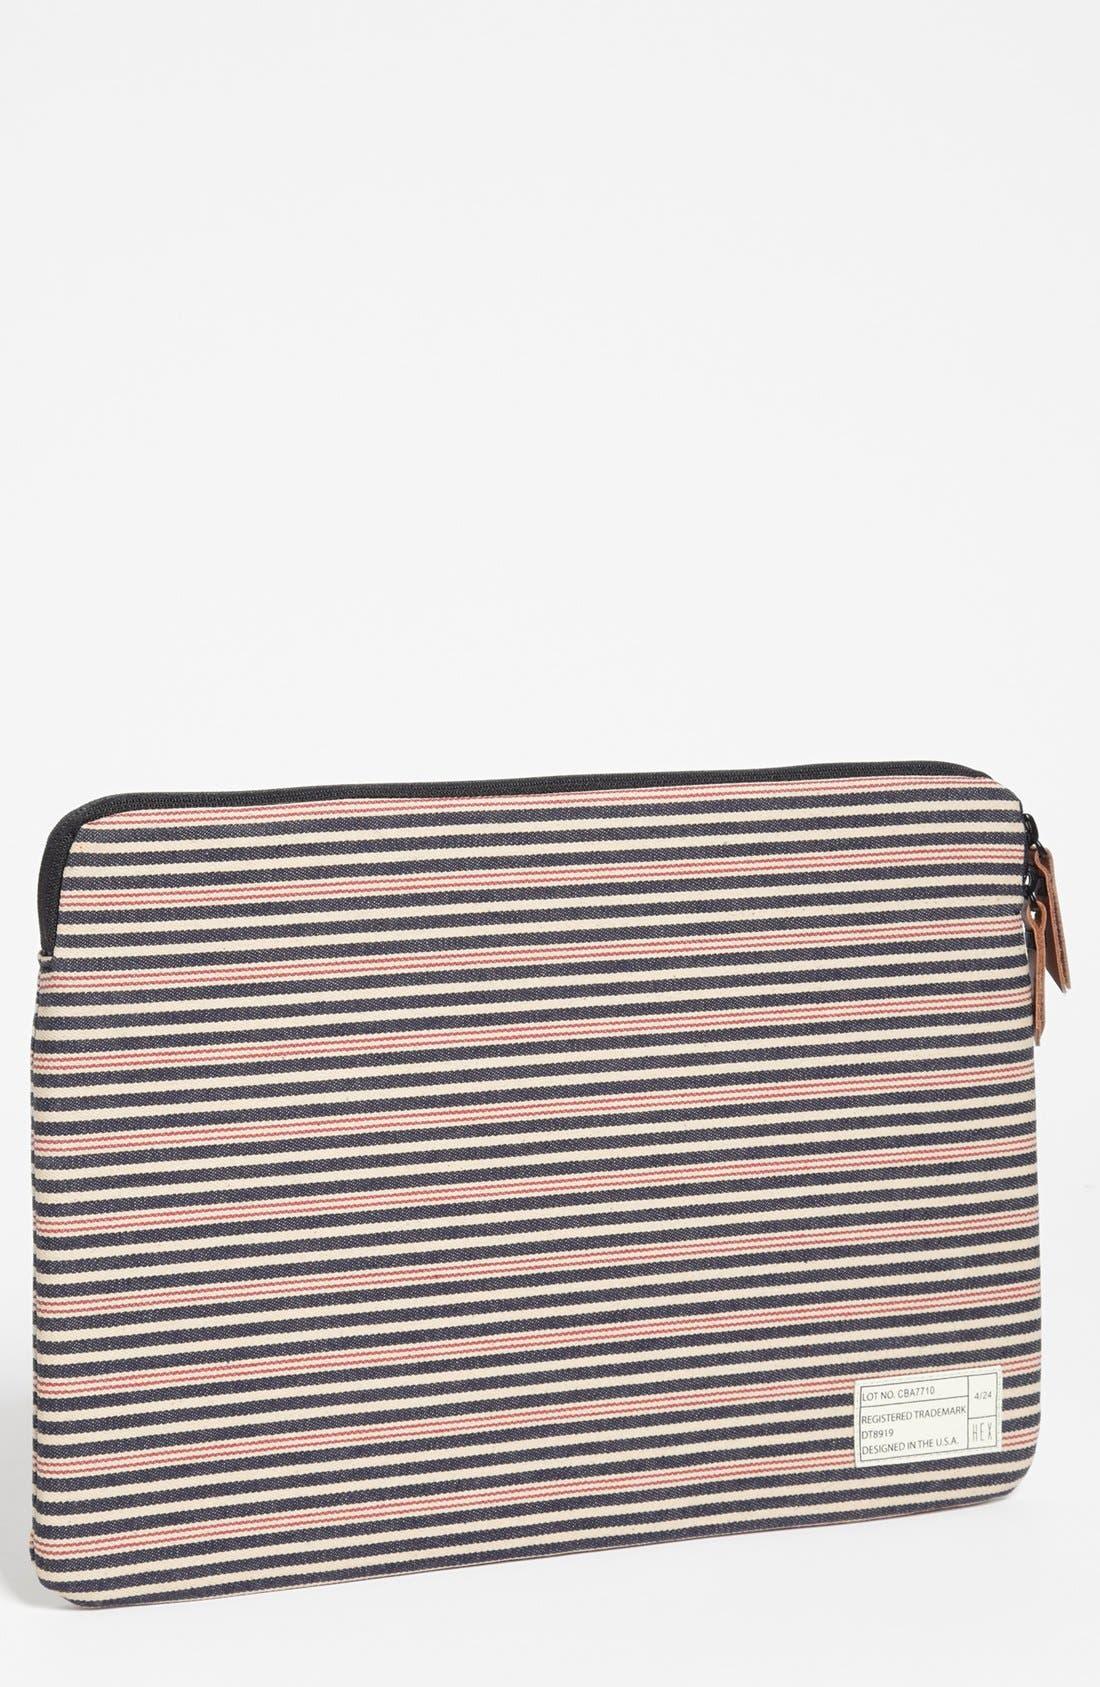 Main Image - HEX 'Cabana' MacBook Air Sleeve (13 Inch)